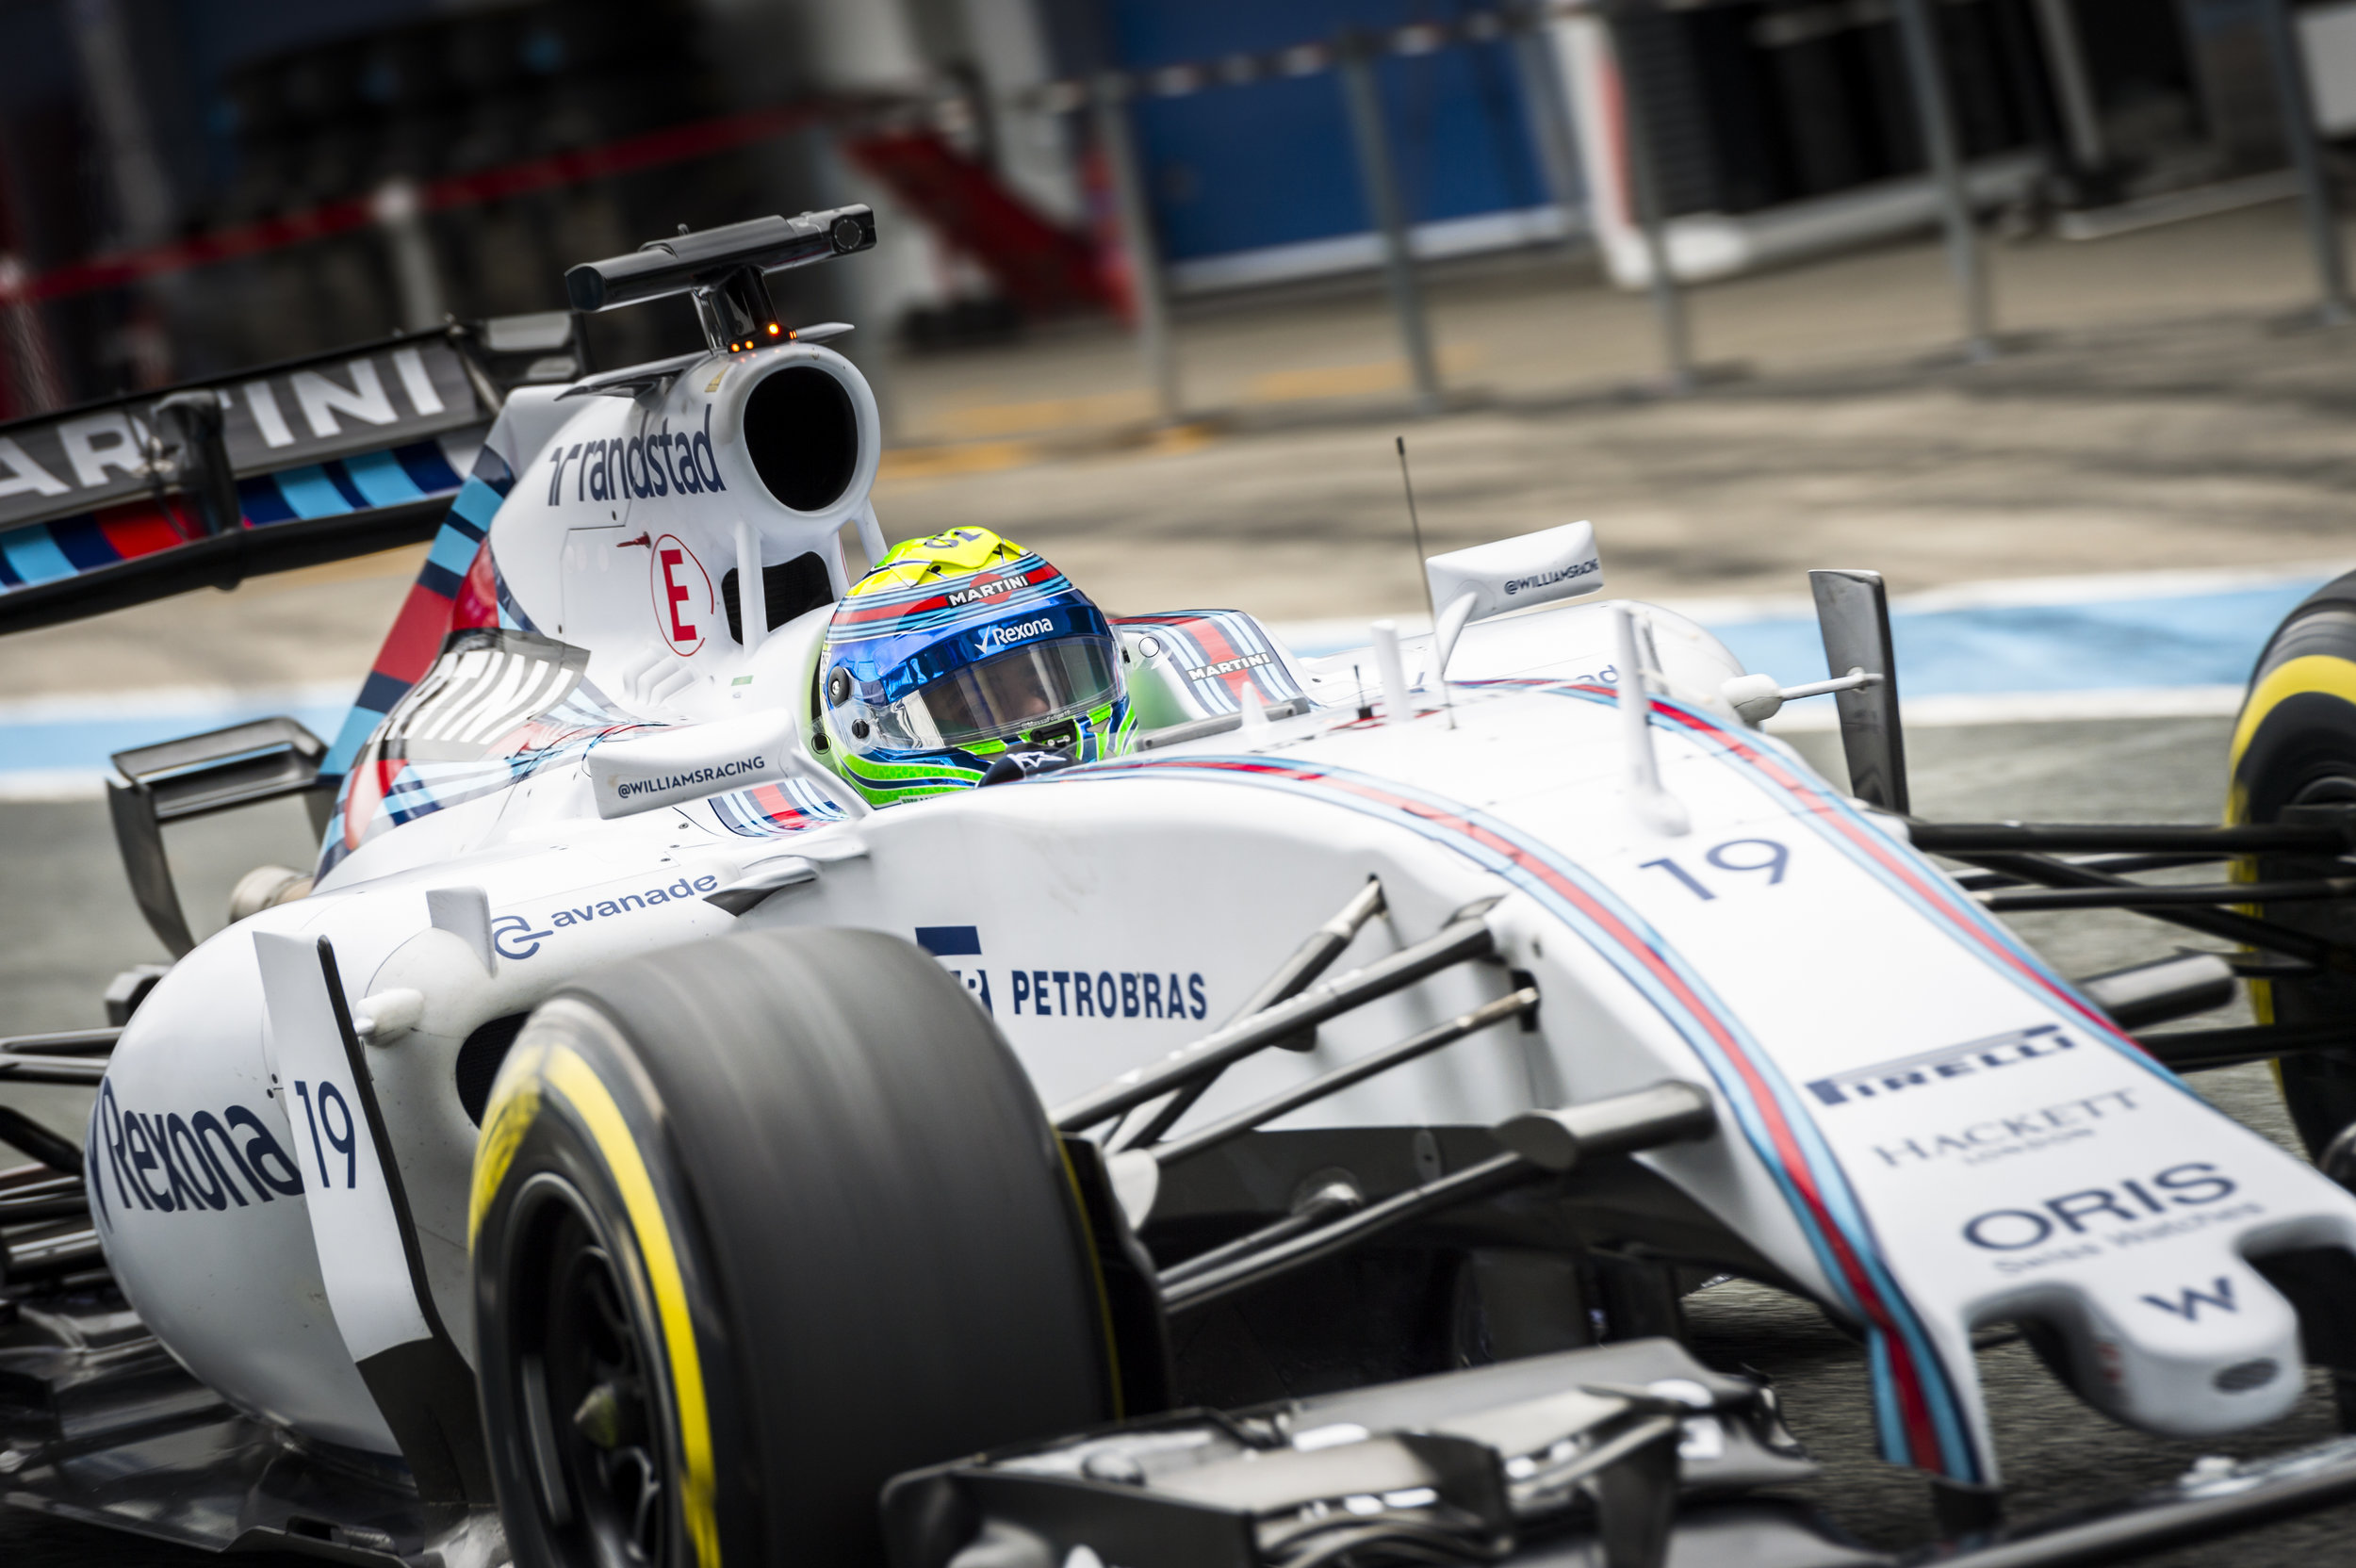 Massa-pit (1000 of 1).jpg